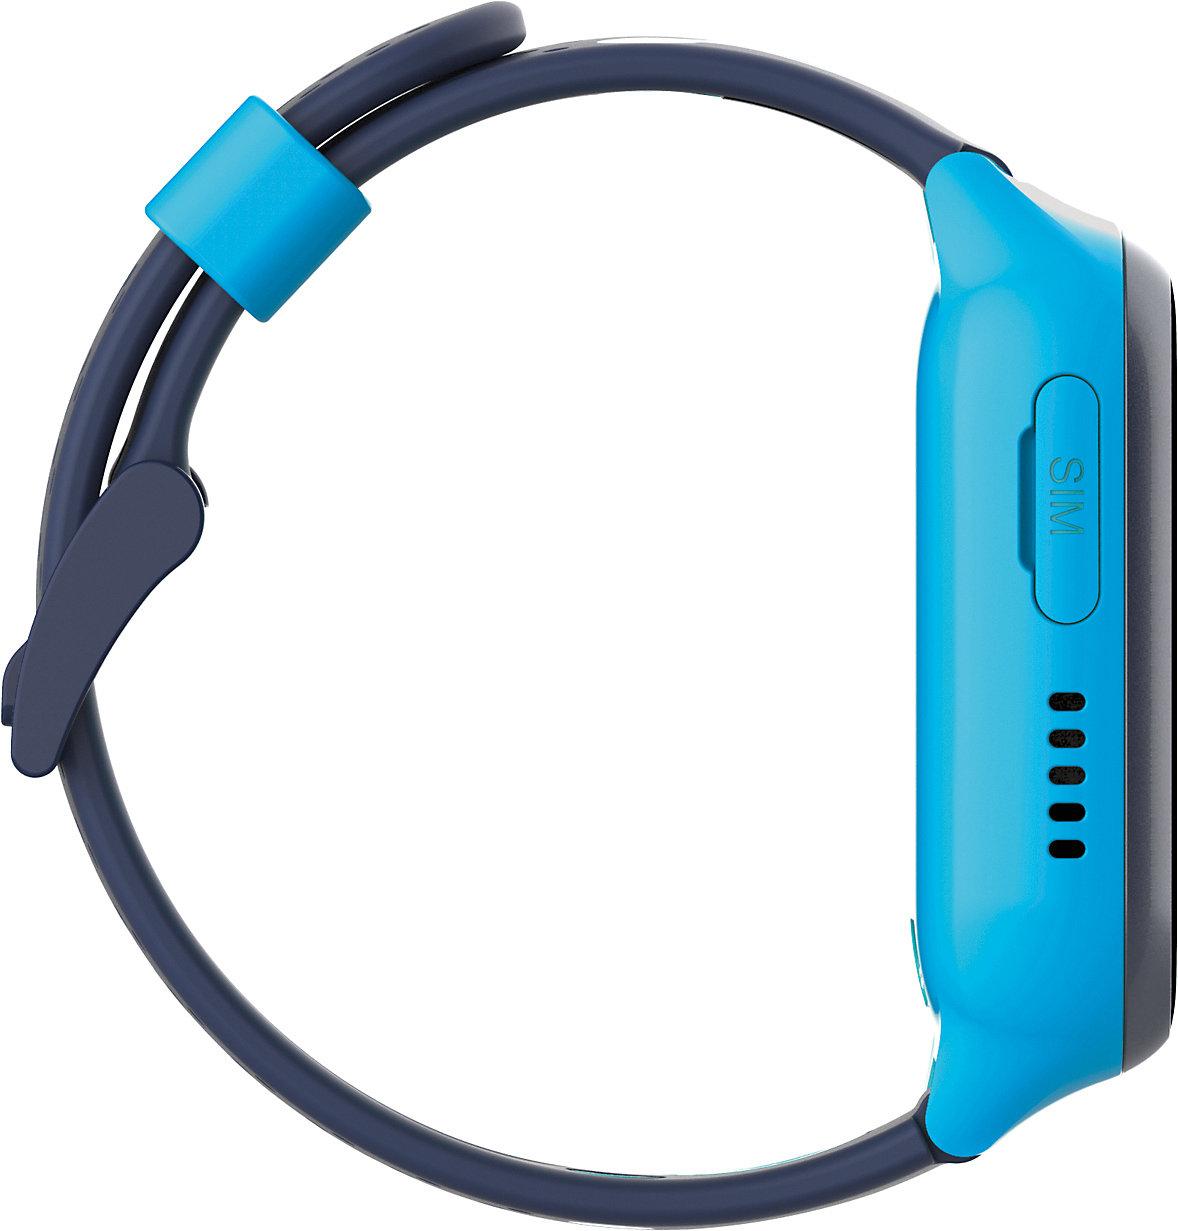 neu xplora 4  smartwatch für kinder  sim free blau